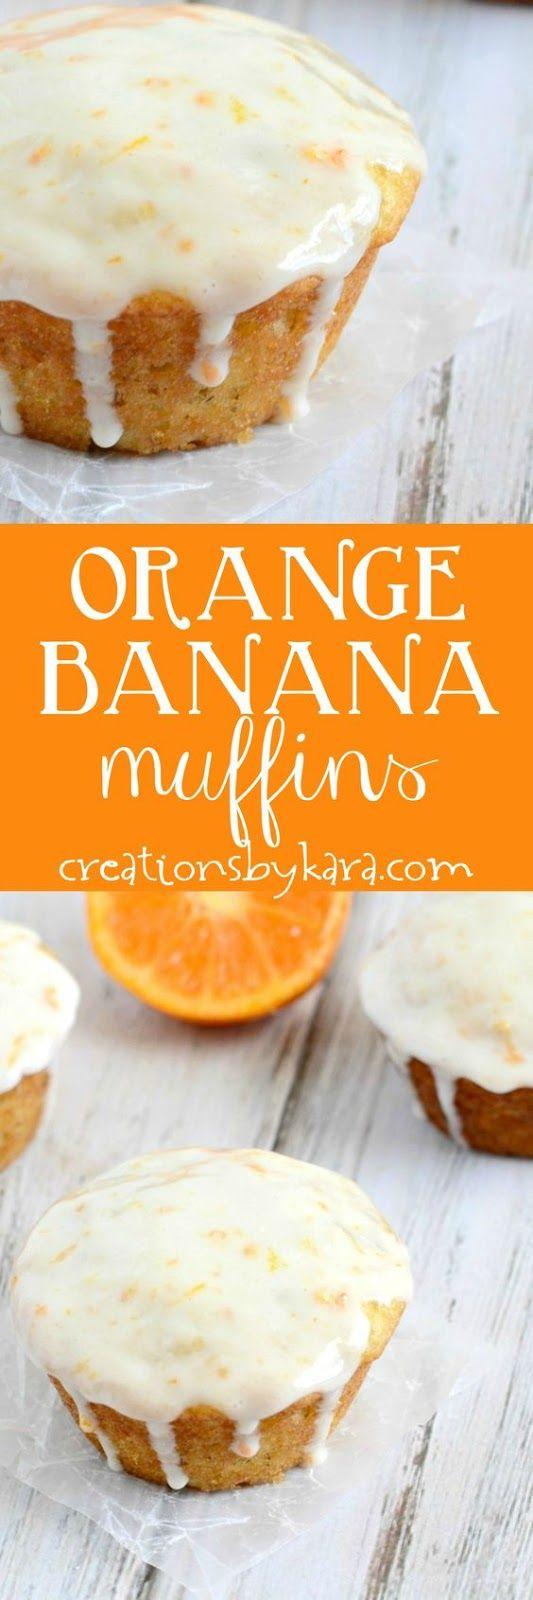 Orange Banana Muffins with Sour Cream Glaze   Food And Cake Recipes